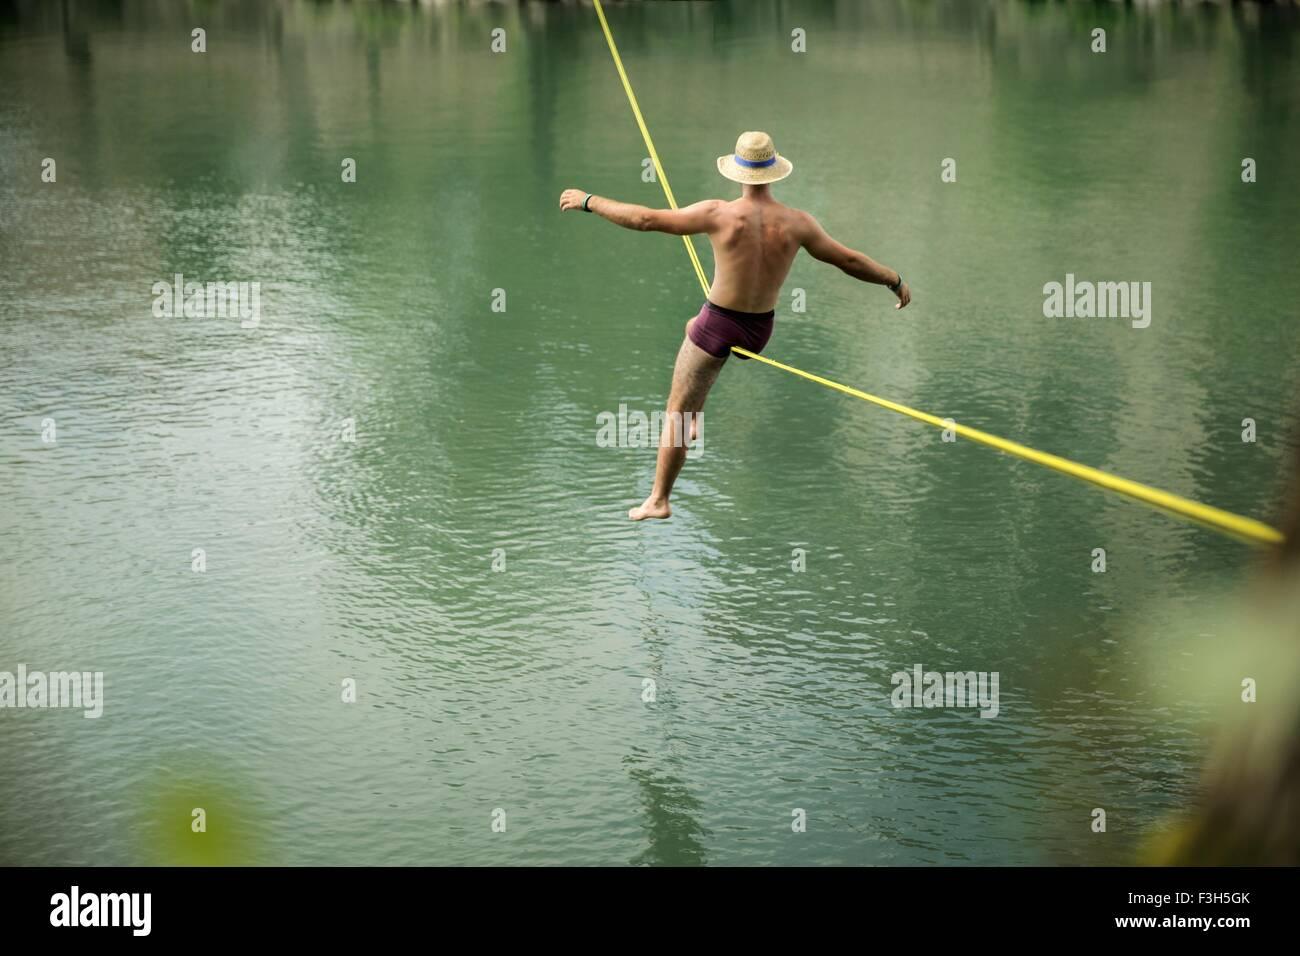 Reifer Mann balancieren auf Seil über See, Rückansicht Stockbild